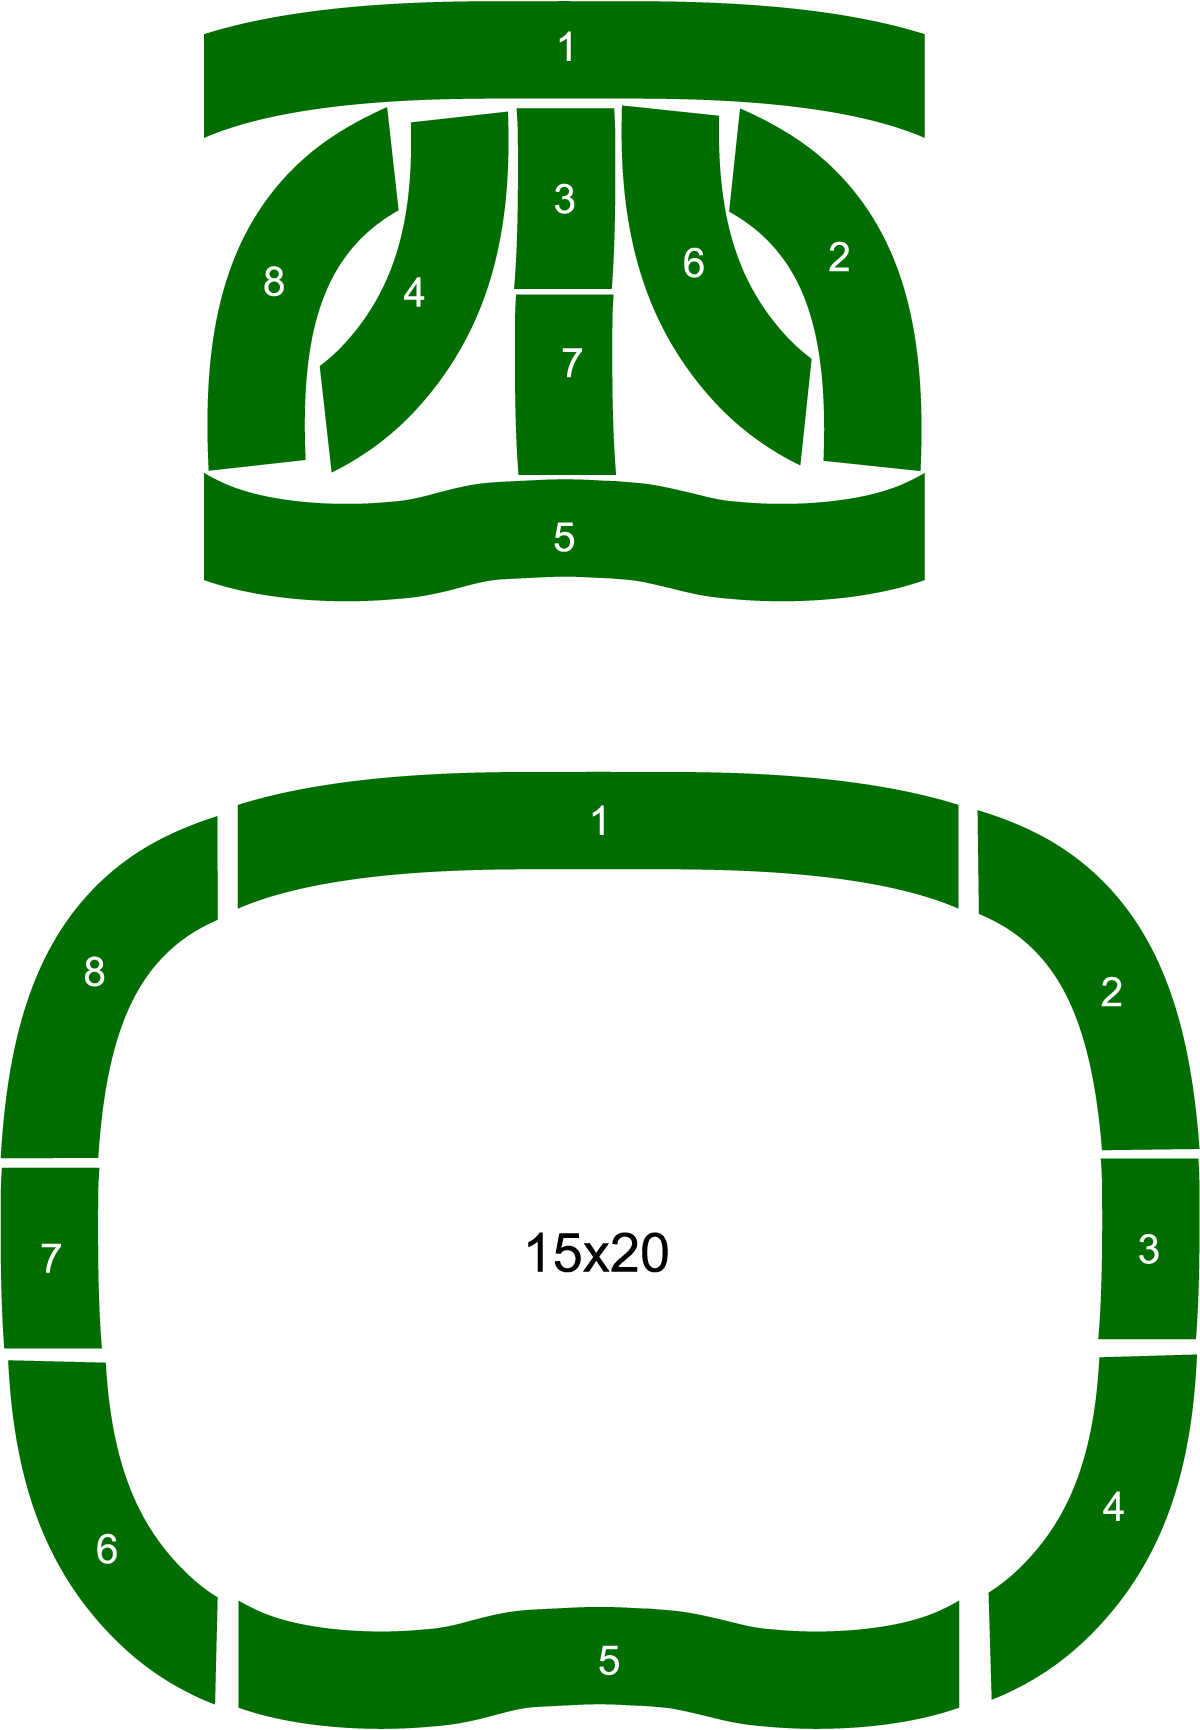 19' x 24' Pro 5-Hole Backyard / Indoor Putting Green w/Border